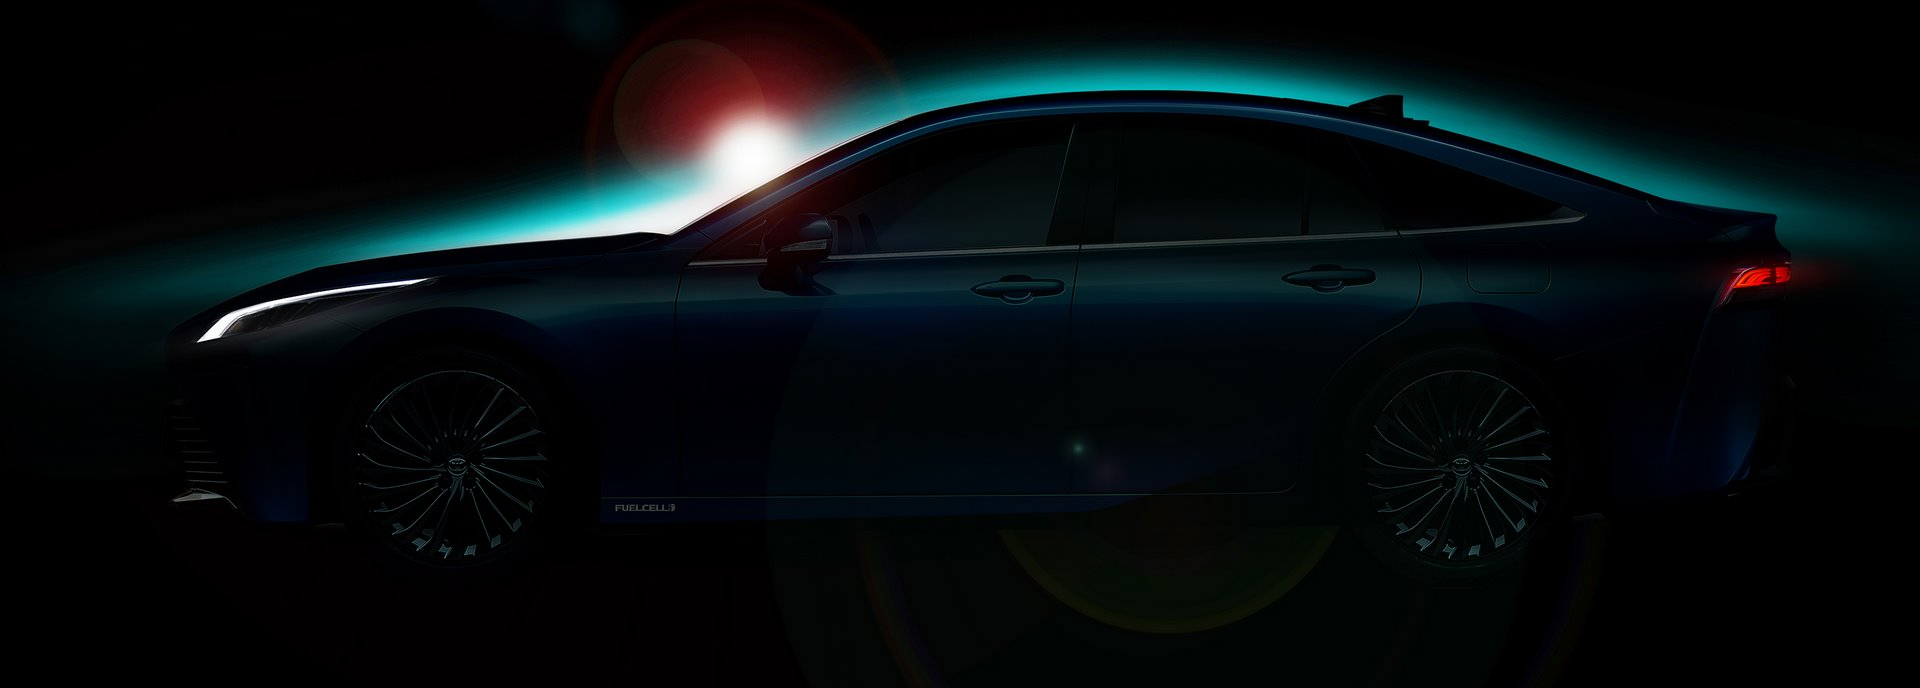 Toyota-Mirai-concept-6